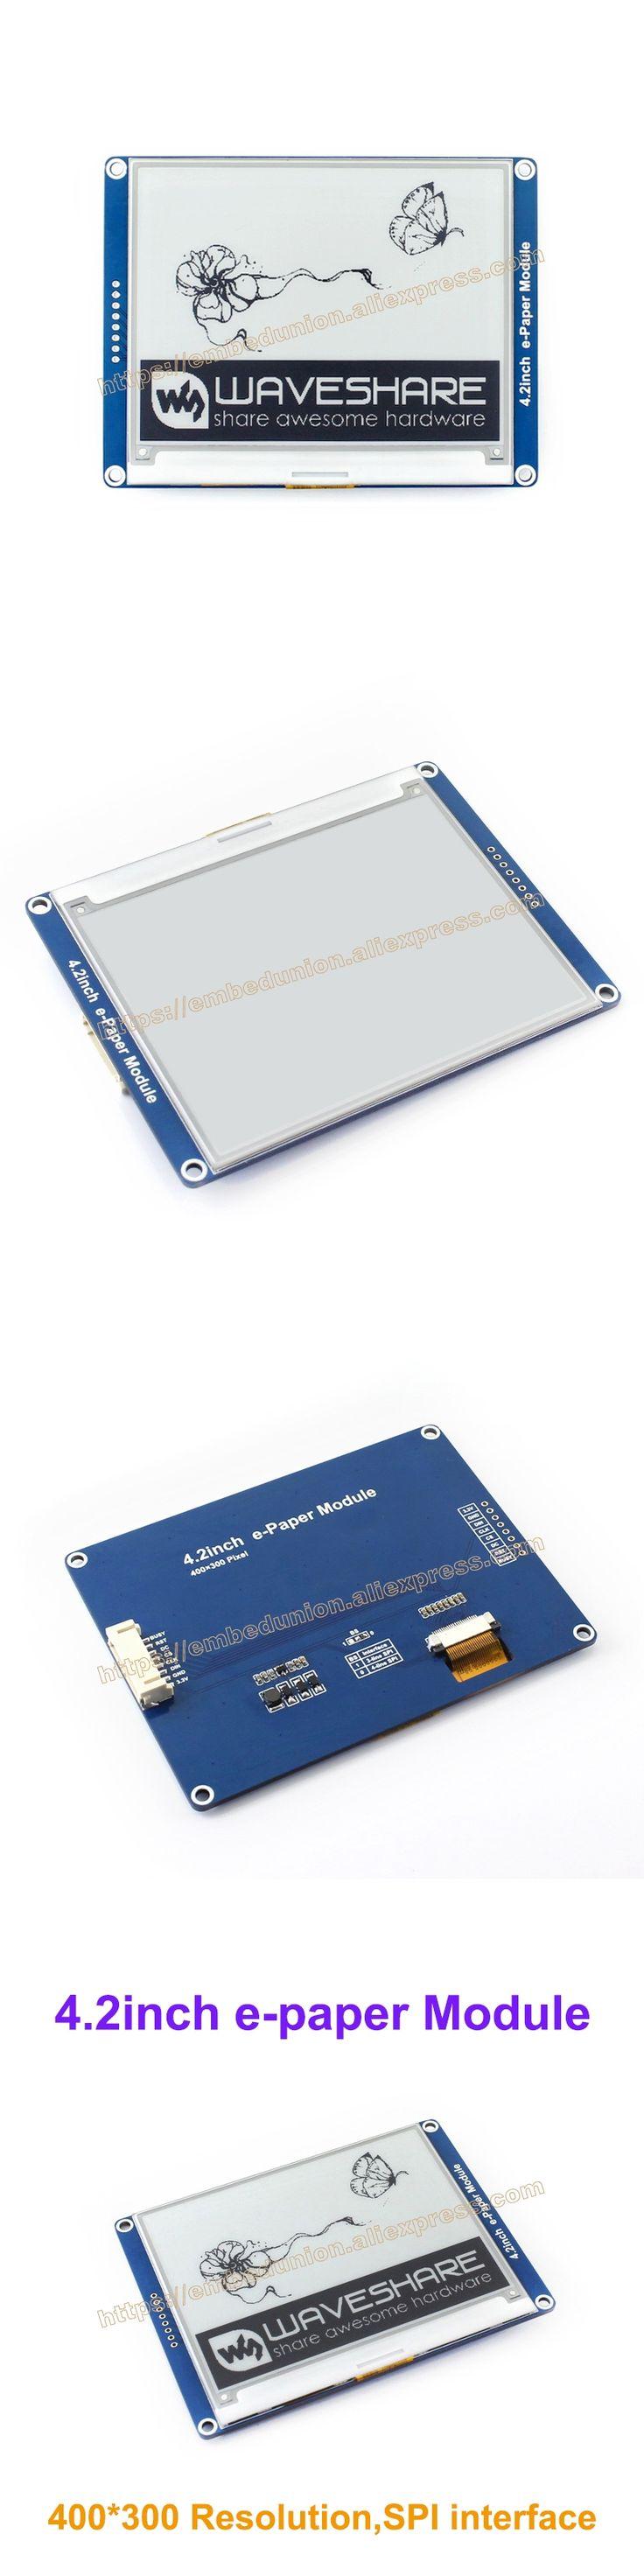 4.2inch e-paper 400x300 E-Ink Drive Demo board display module Display color:black&white. No backlight wide angle, SPI interface